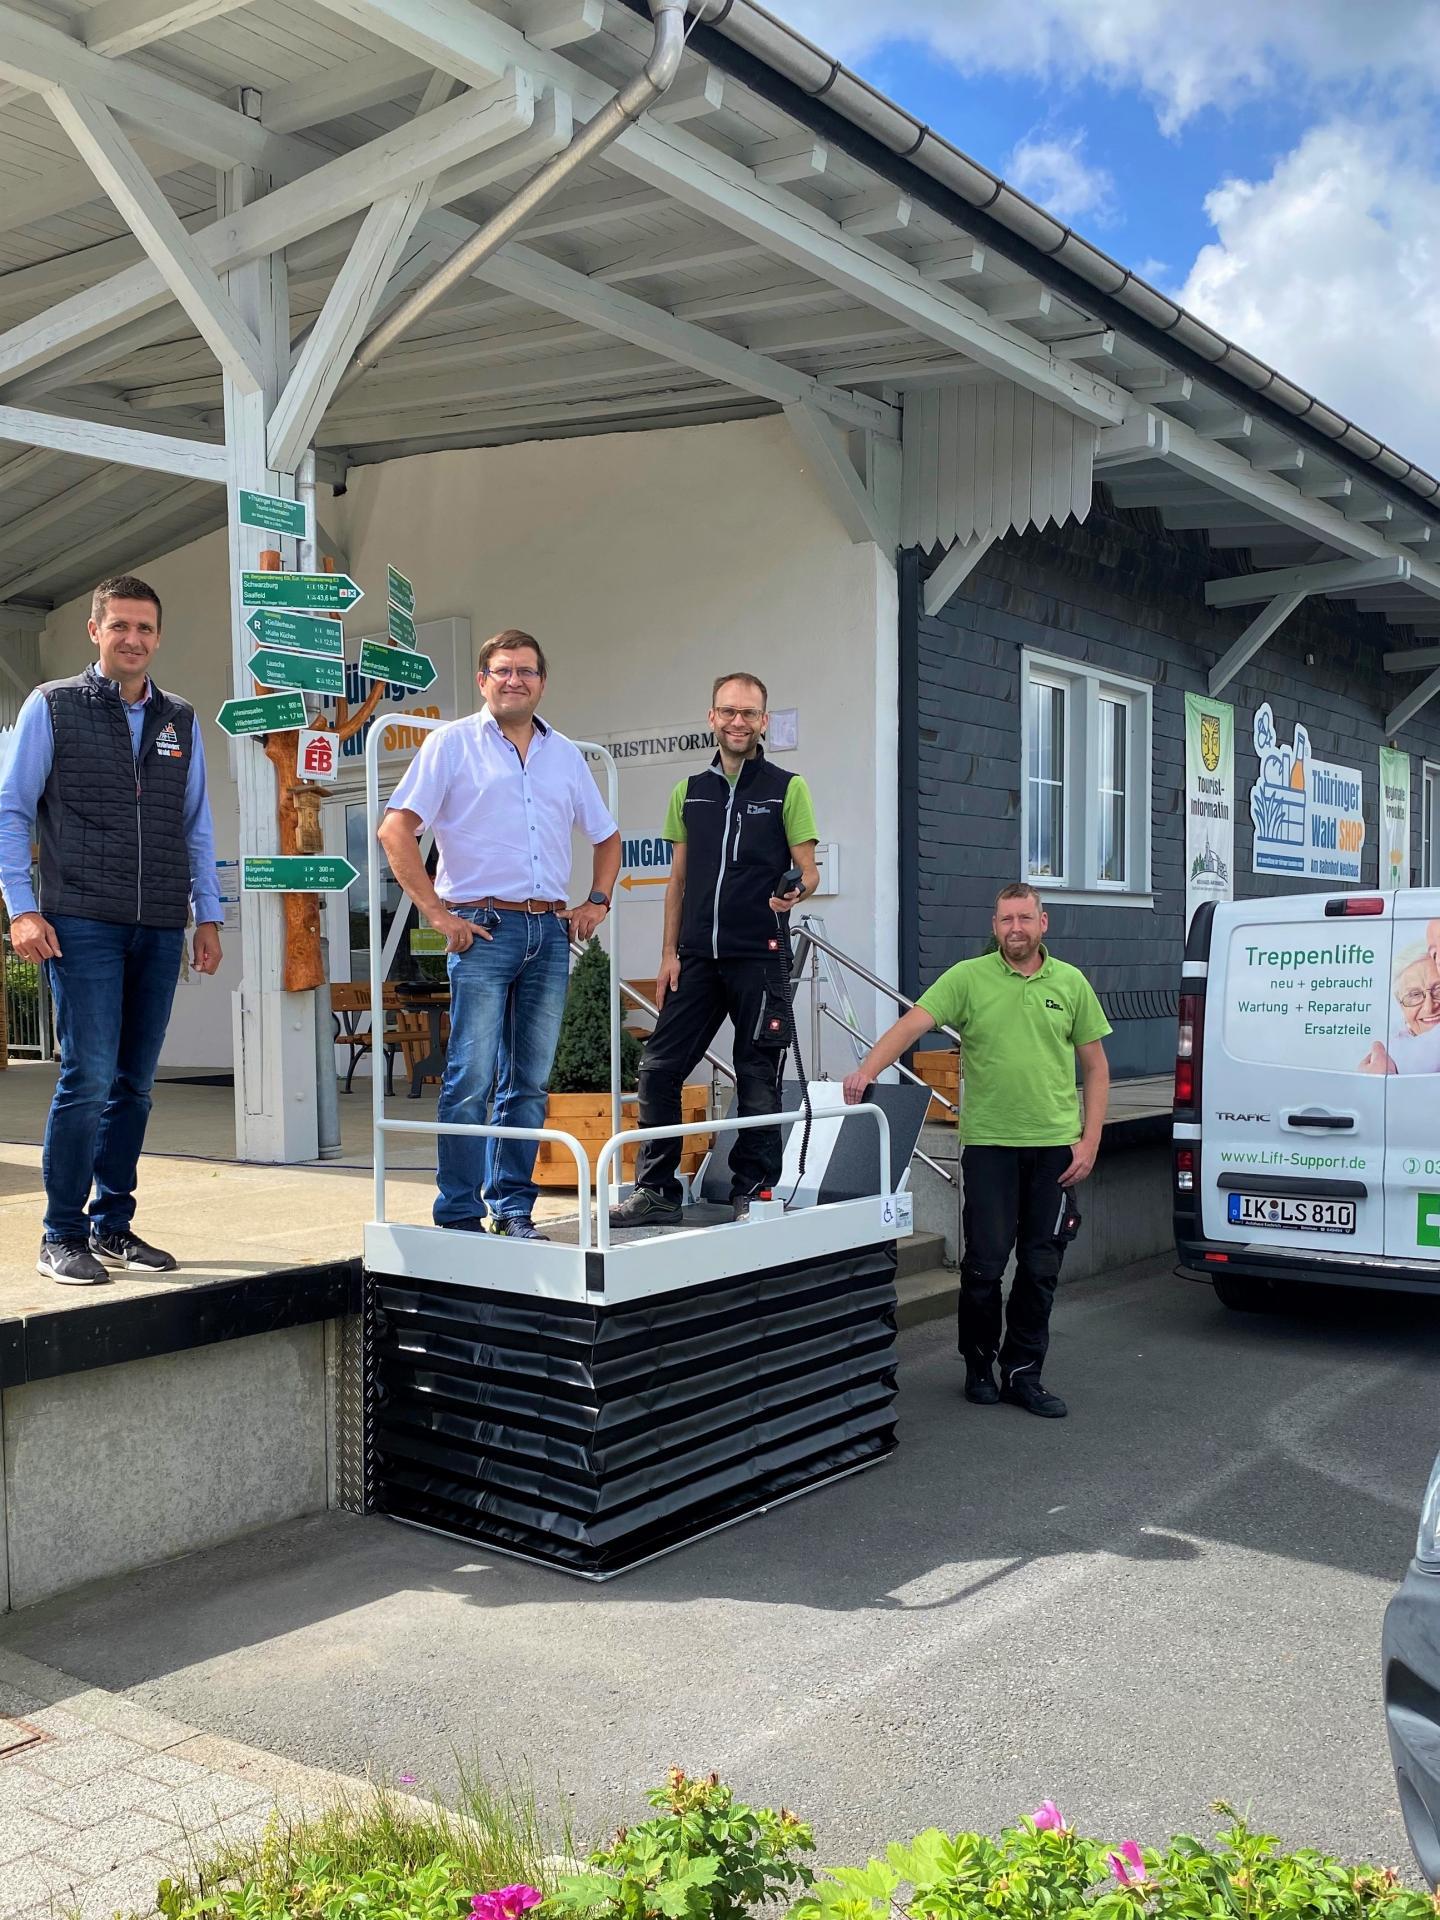 Der neue Lift am Thüringer Wald Shop geht am 16.08.2021 in Betrieb